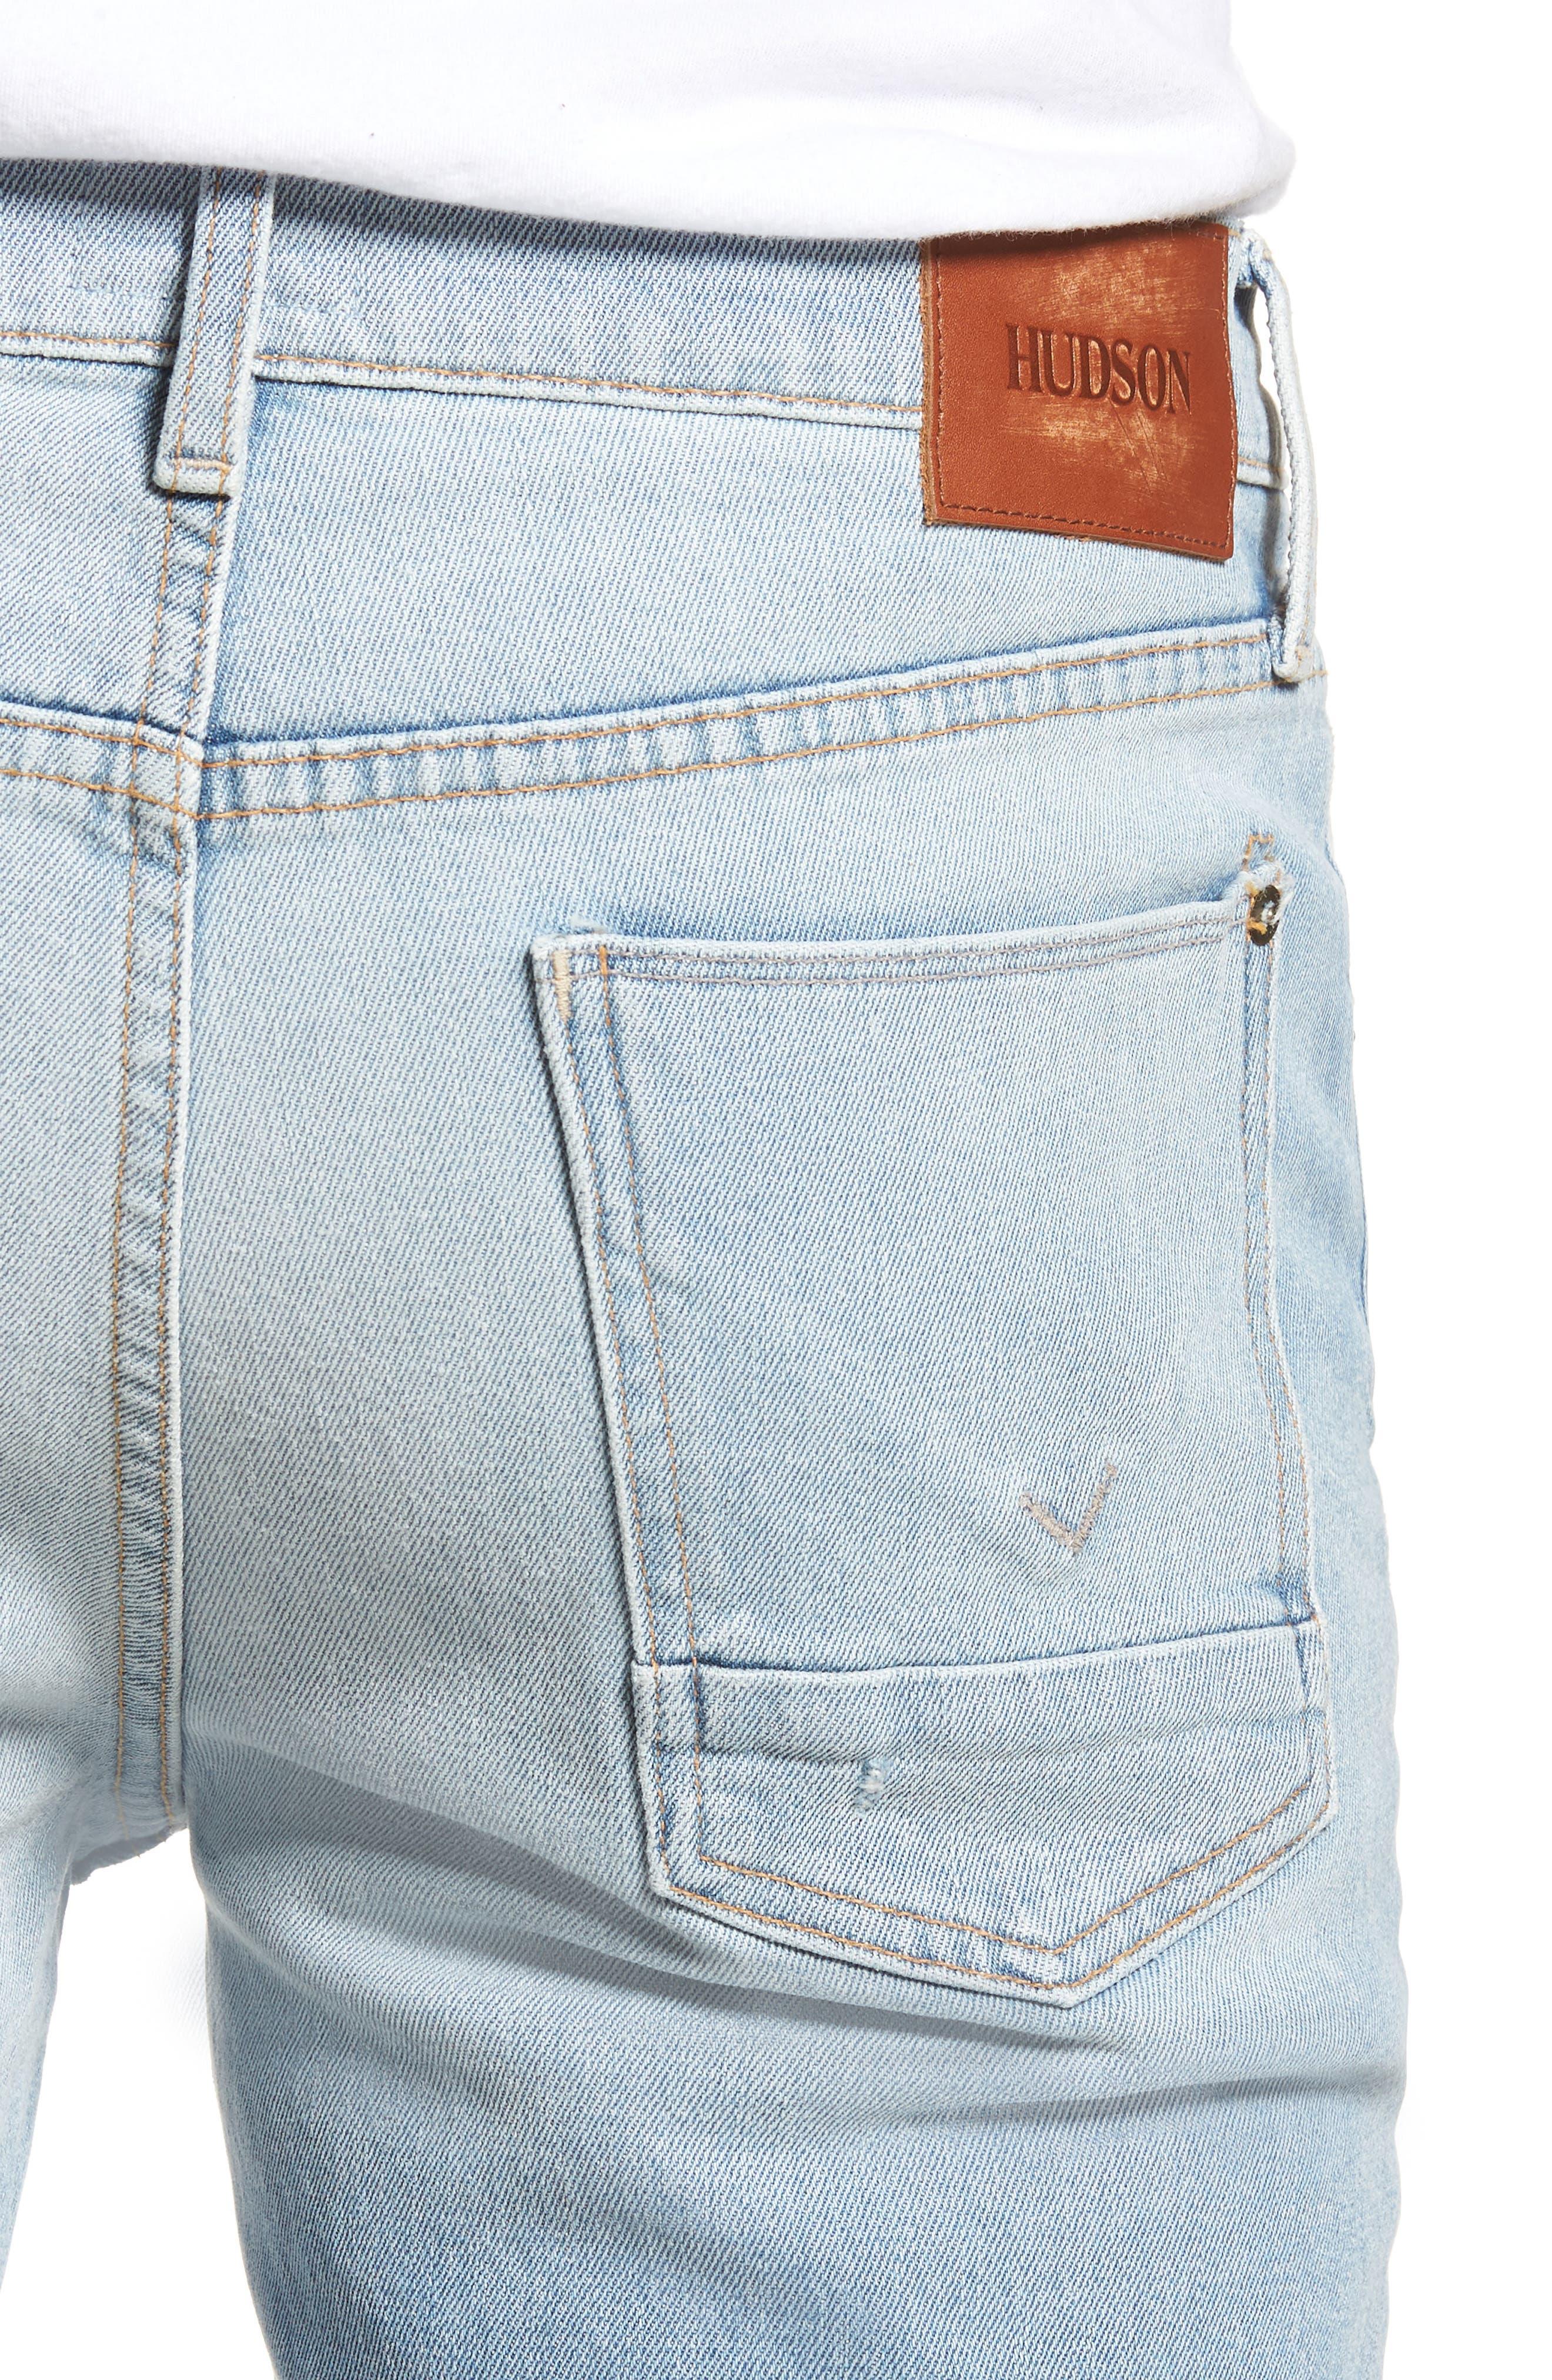 Axl Skinny Fit Jeans,                             Alternate thumbnail 4, color,                             BLAZE